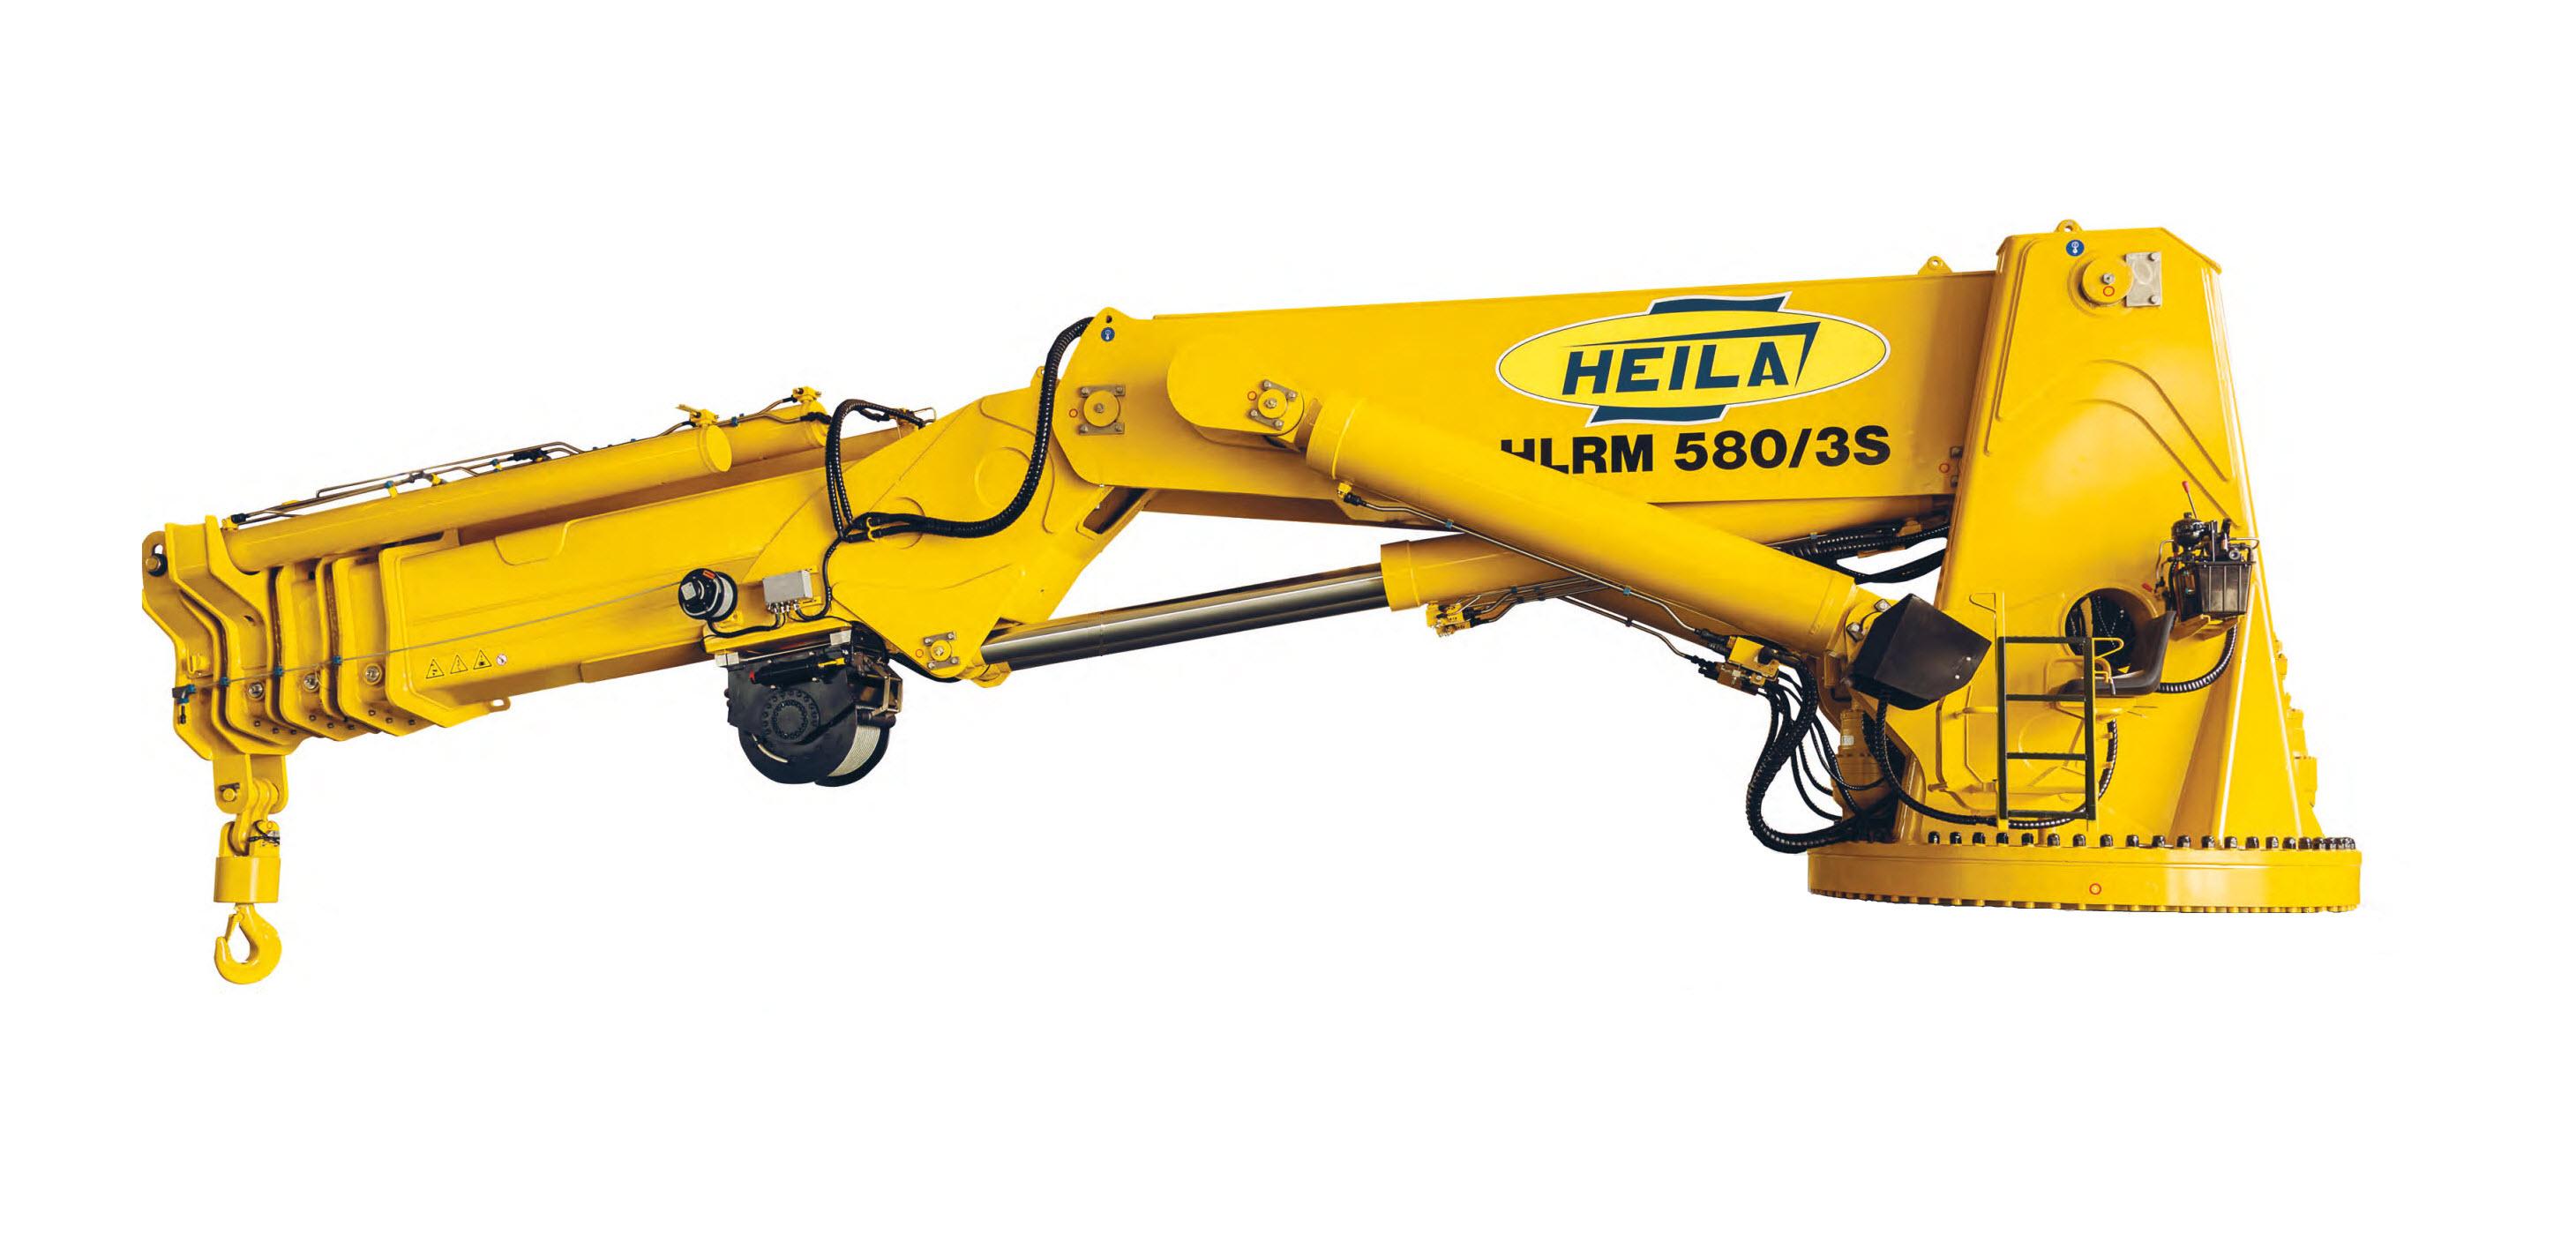 HLRM 580-3S